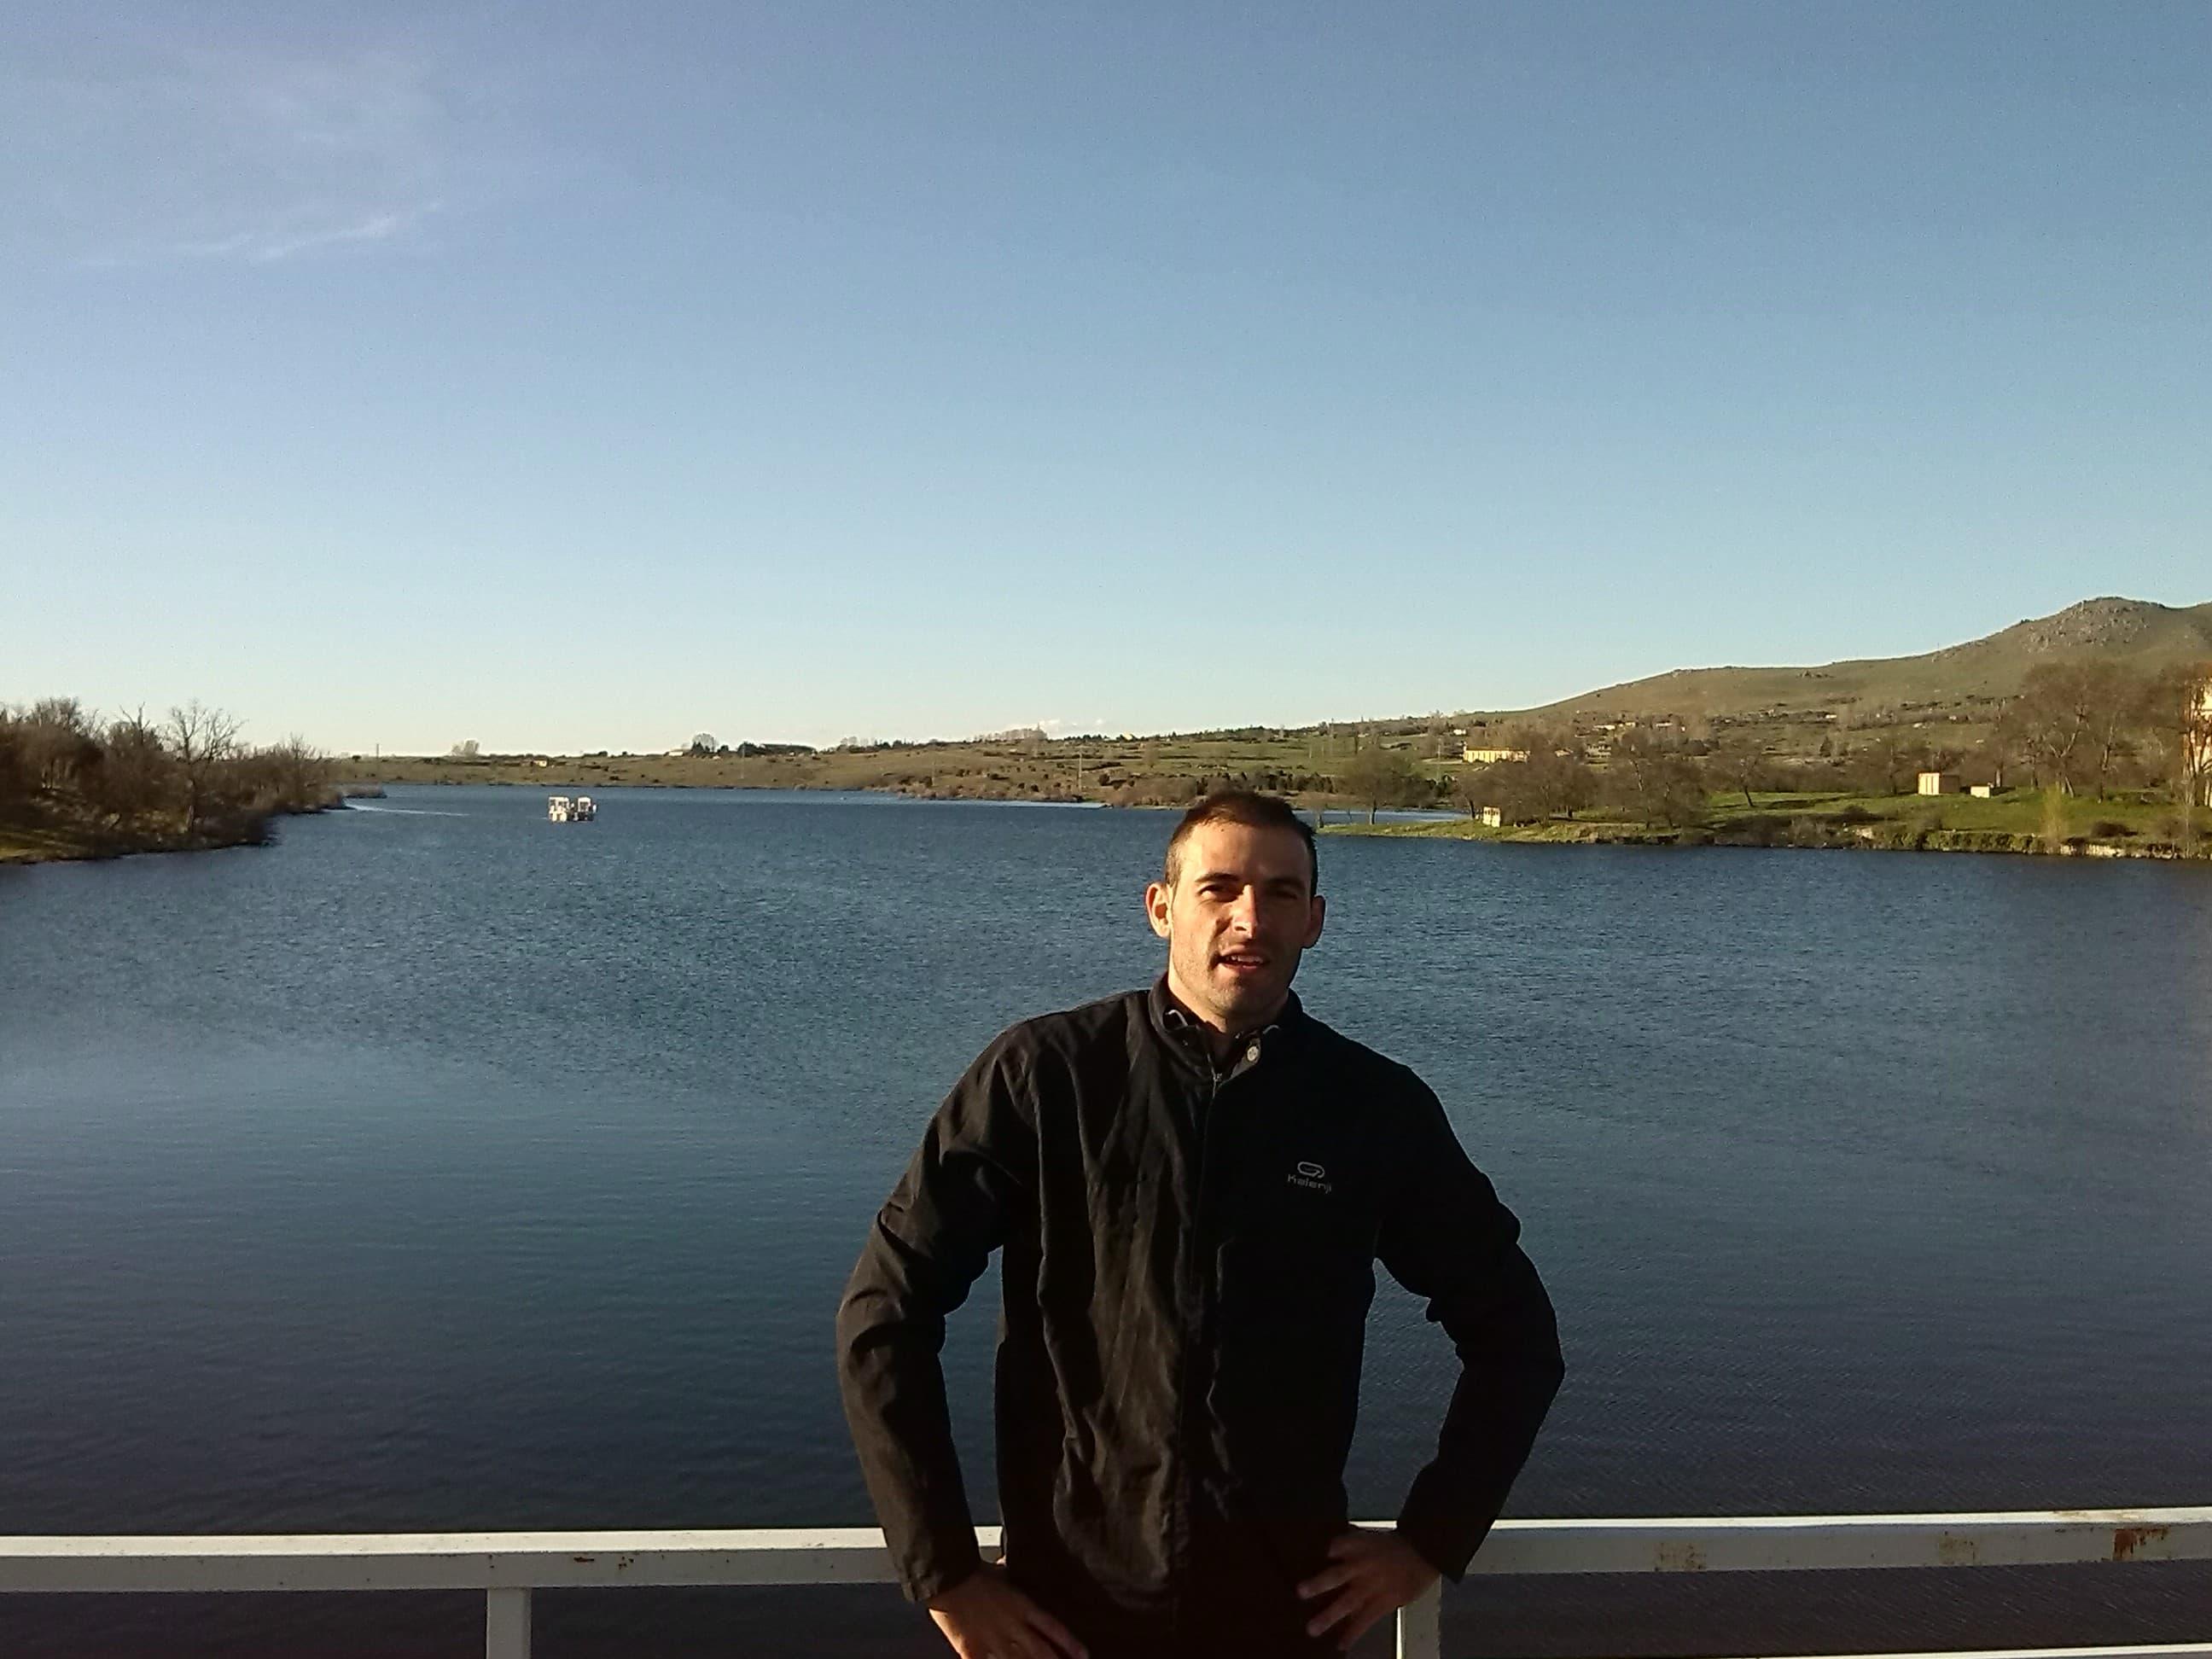 Bonitos paisajes !!